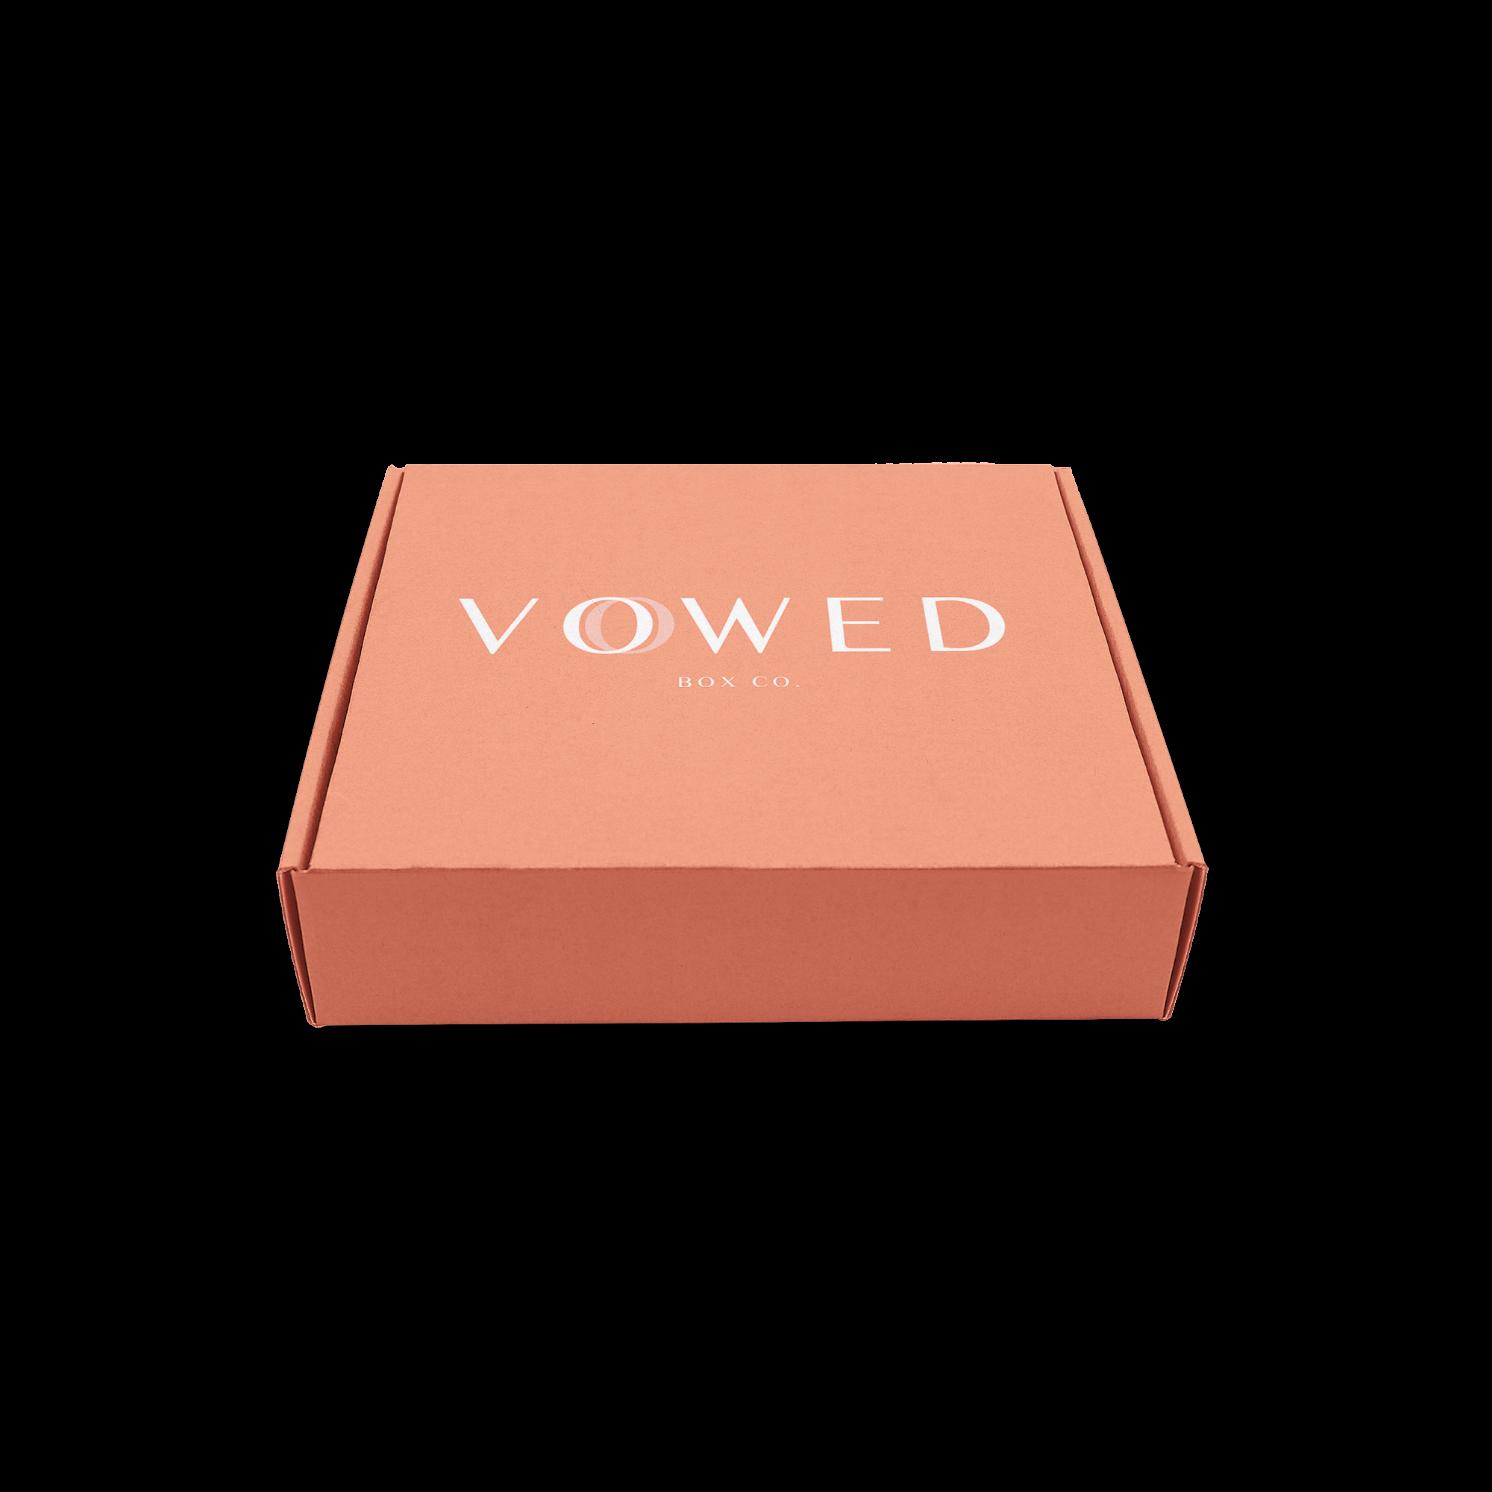 bo\u00eete coeur \u30cf\u30fc\u30c8 box hj\u00e4rta \uc0c1\uc790 \ub9c8\uc74c 4 Openwork heart wood box Necklace box Wedding Gift Box Home /& Living D\u00e9cor Home D\u00e9cor \u0410 gift for her